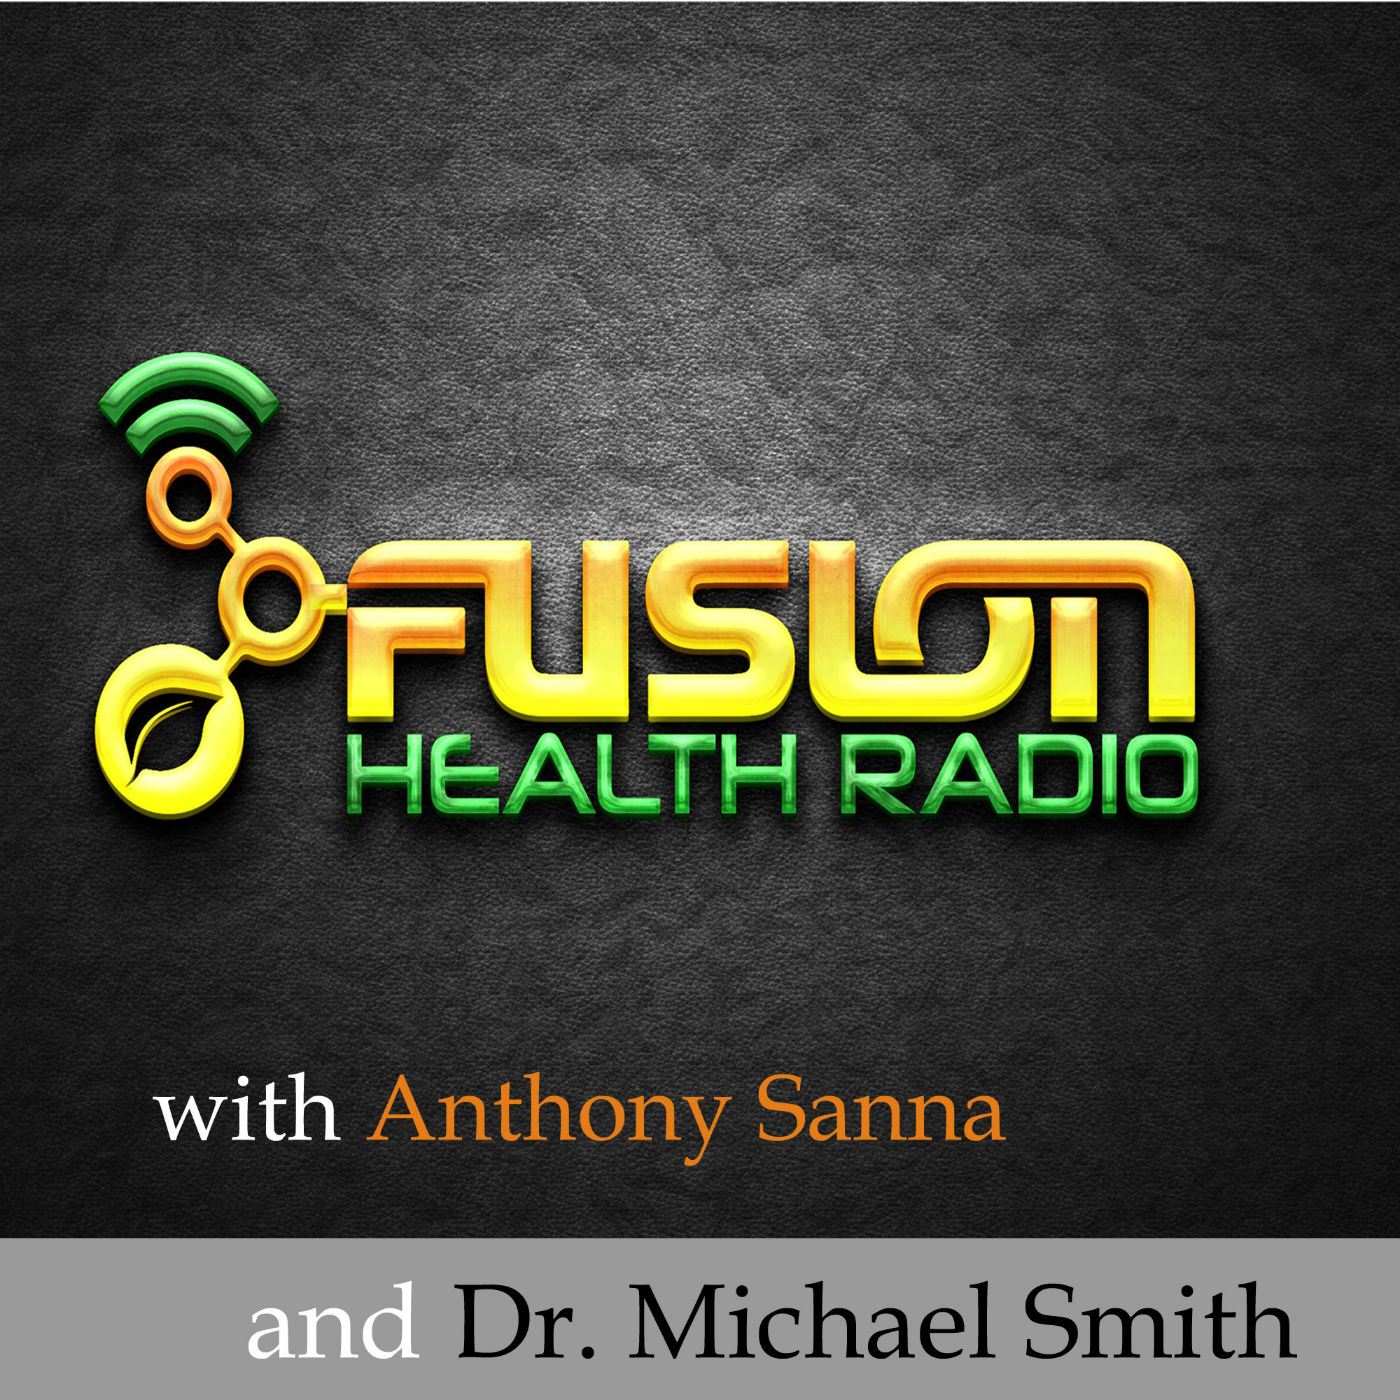 Fusion Health Radio